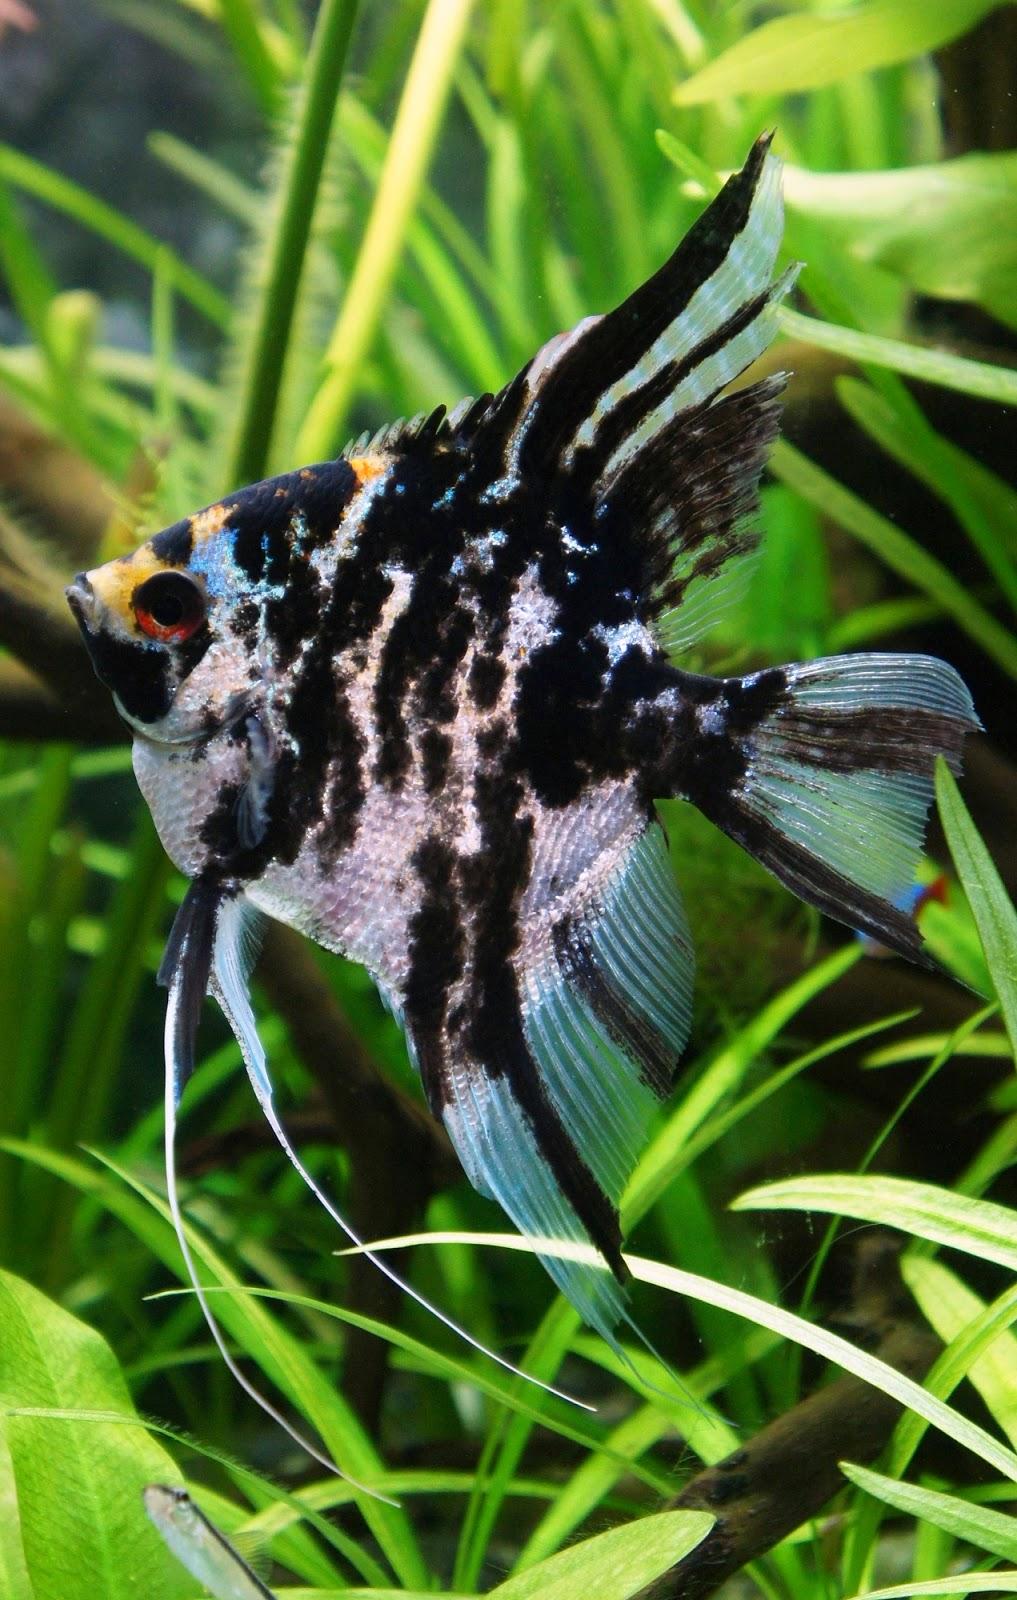 Colorful fish for aquarium freshwater - By Denizka